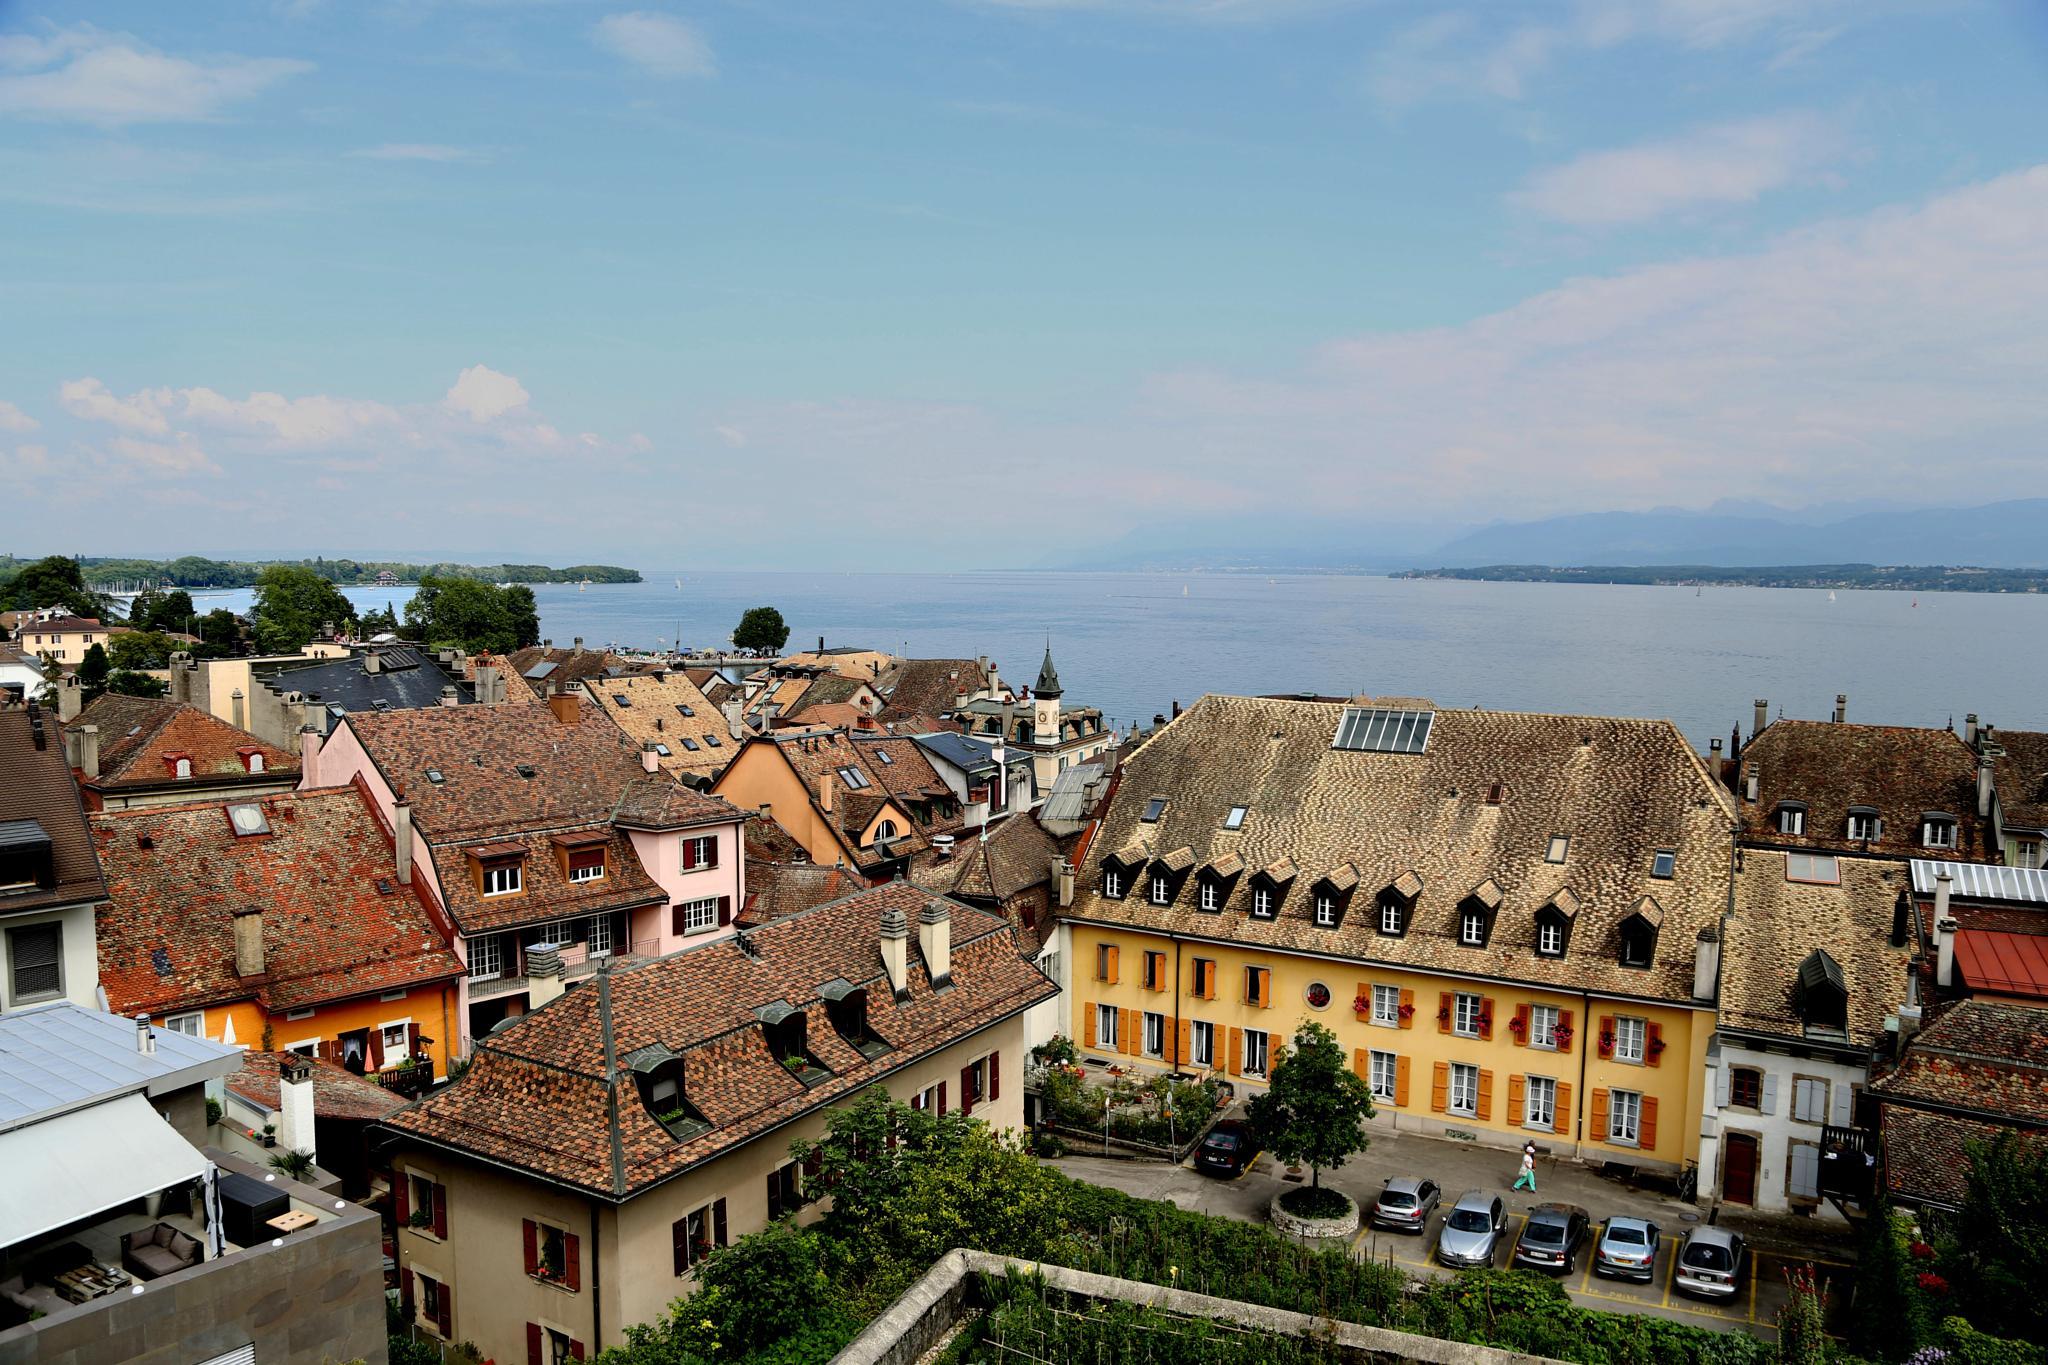 A View of Lake Geneva over the Roof Tops by Atila_Yumusakkaya